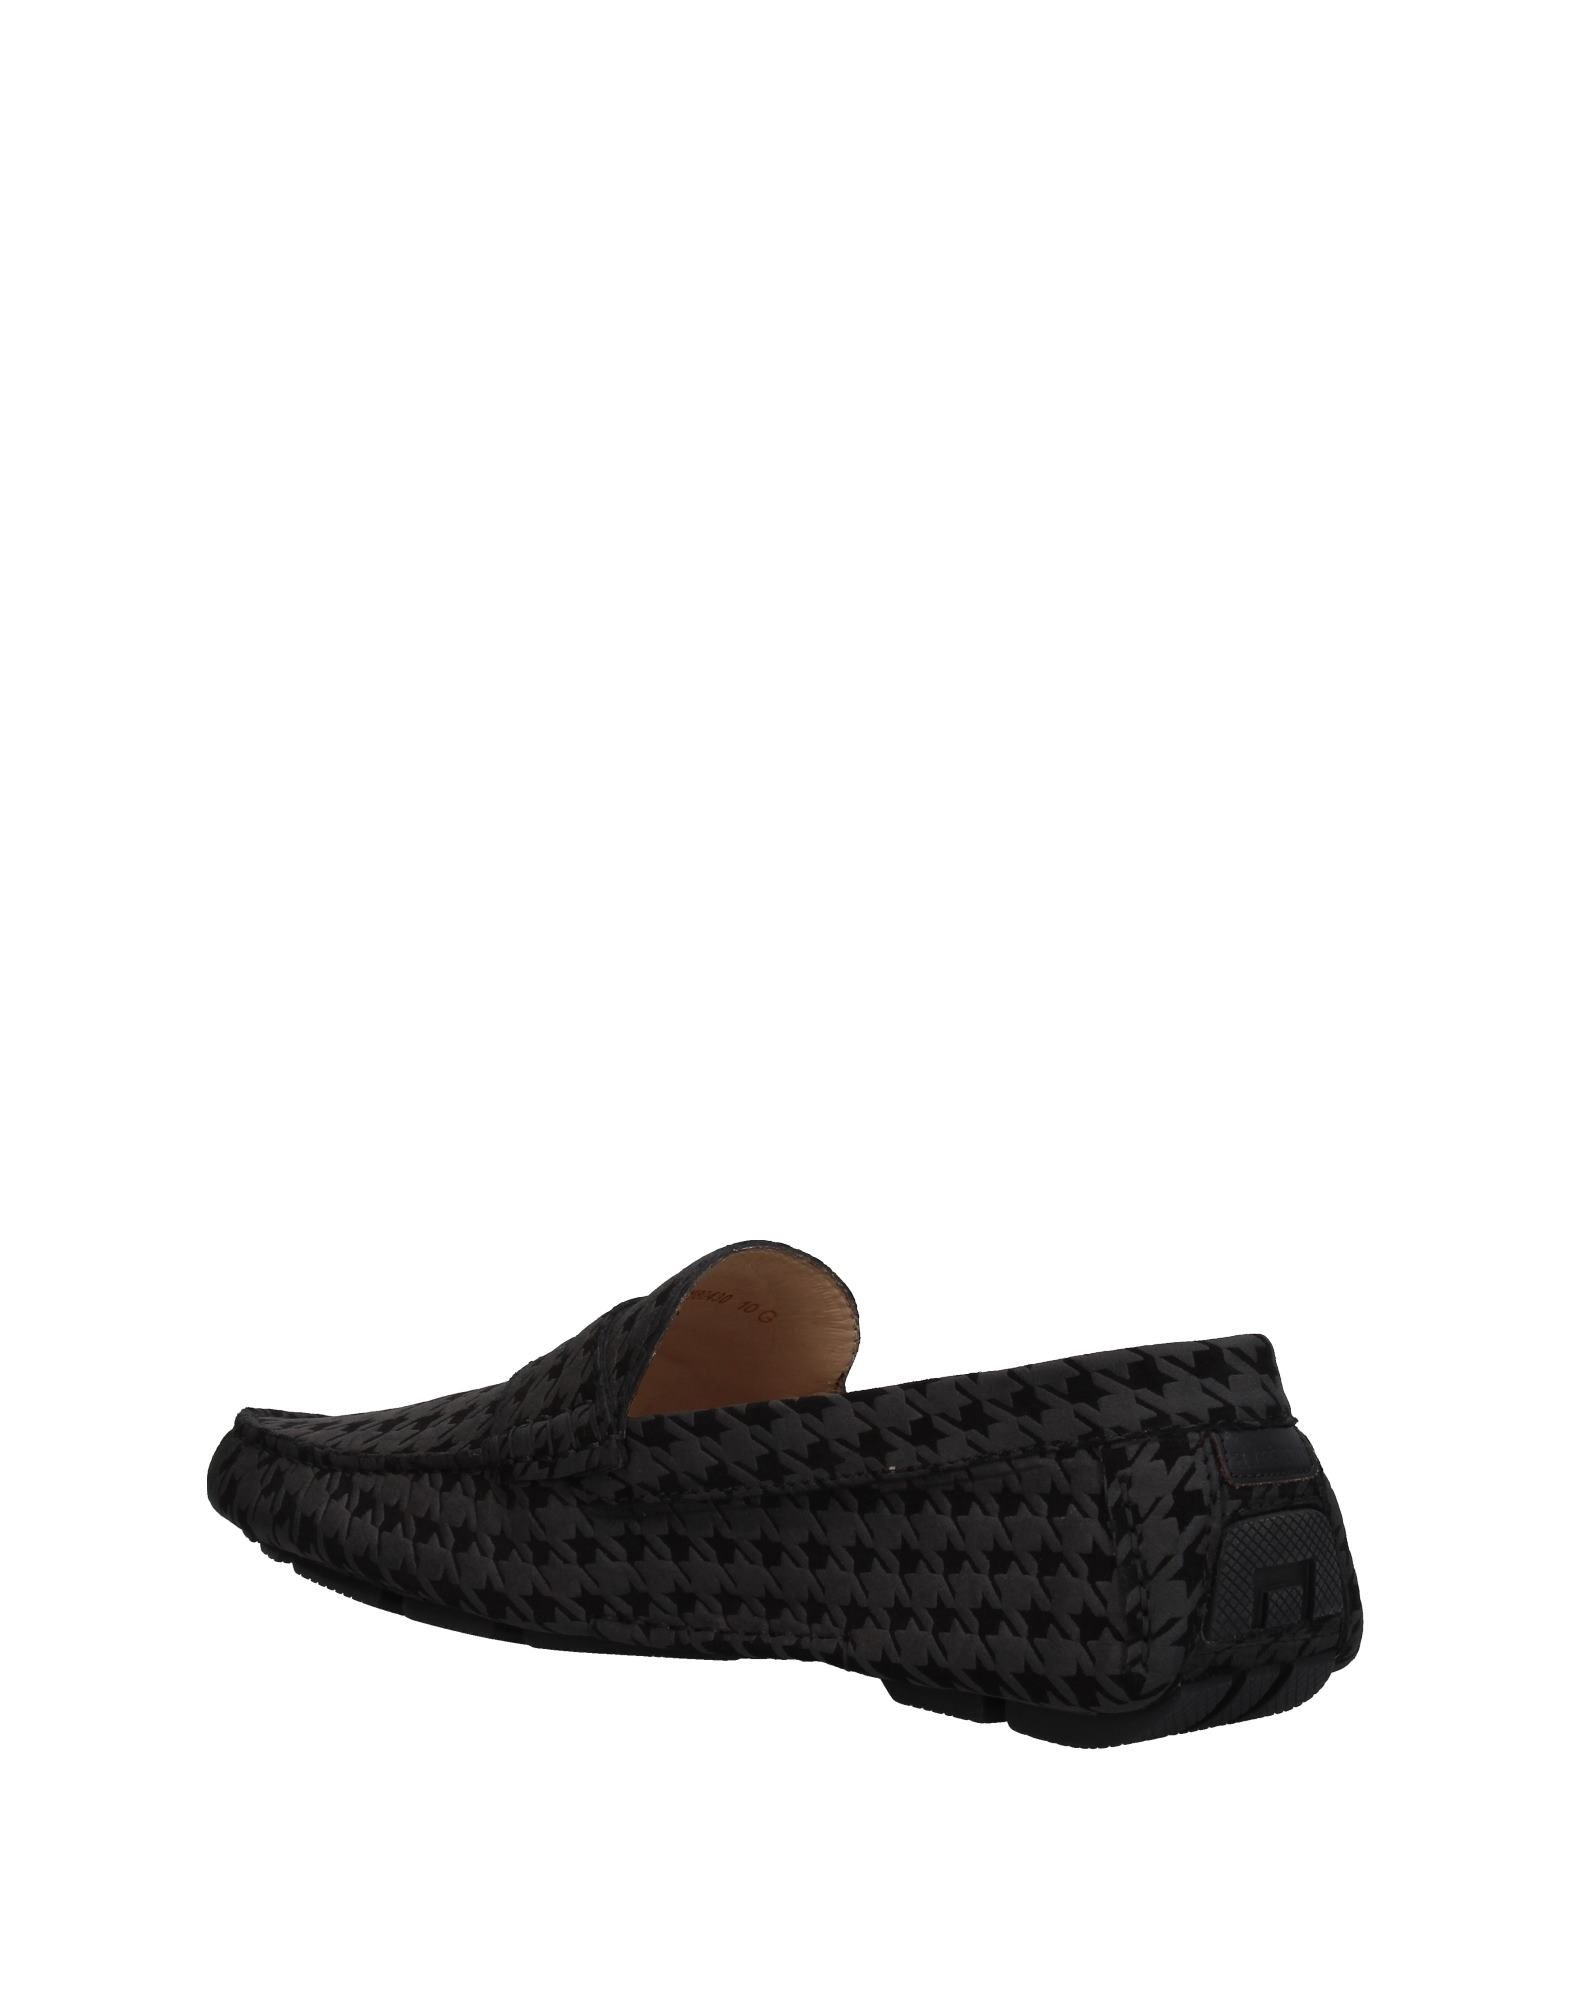 A.Testoni Mokassins Herren  11352385OC Heiße Heiße Heiße Schuhe 303aeb